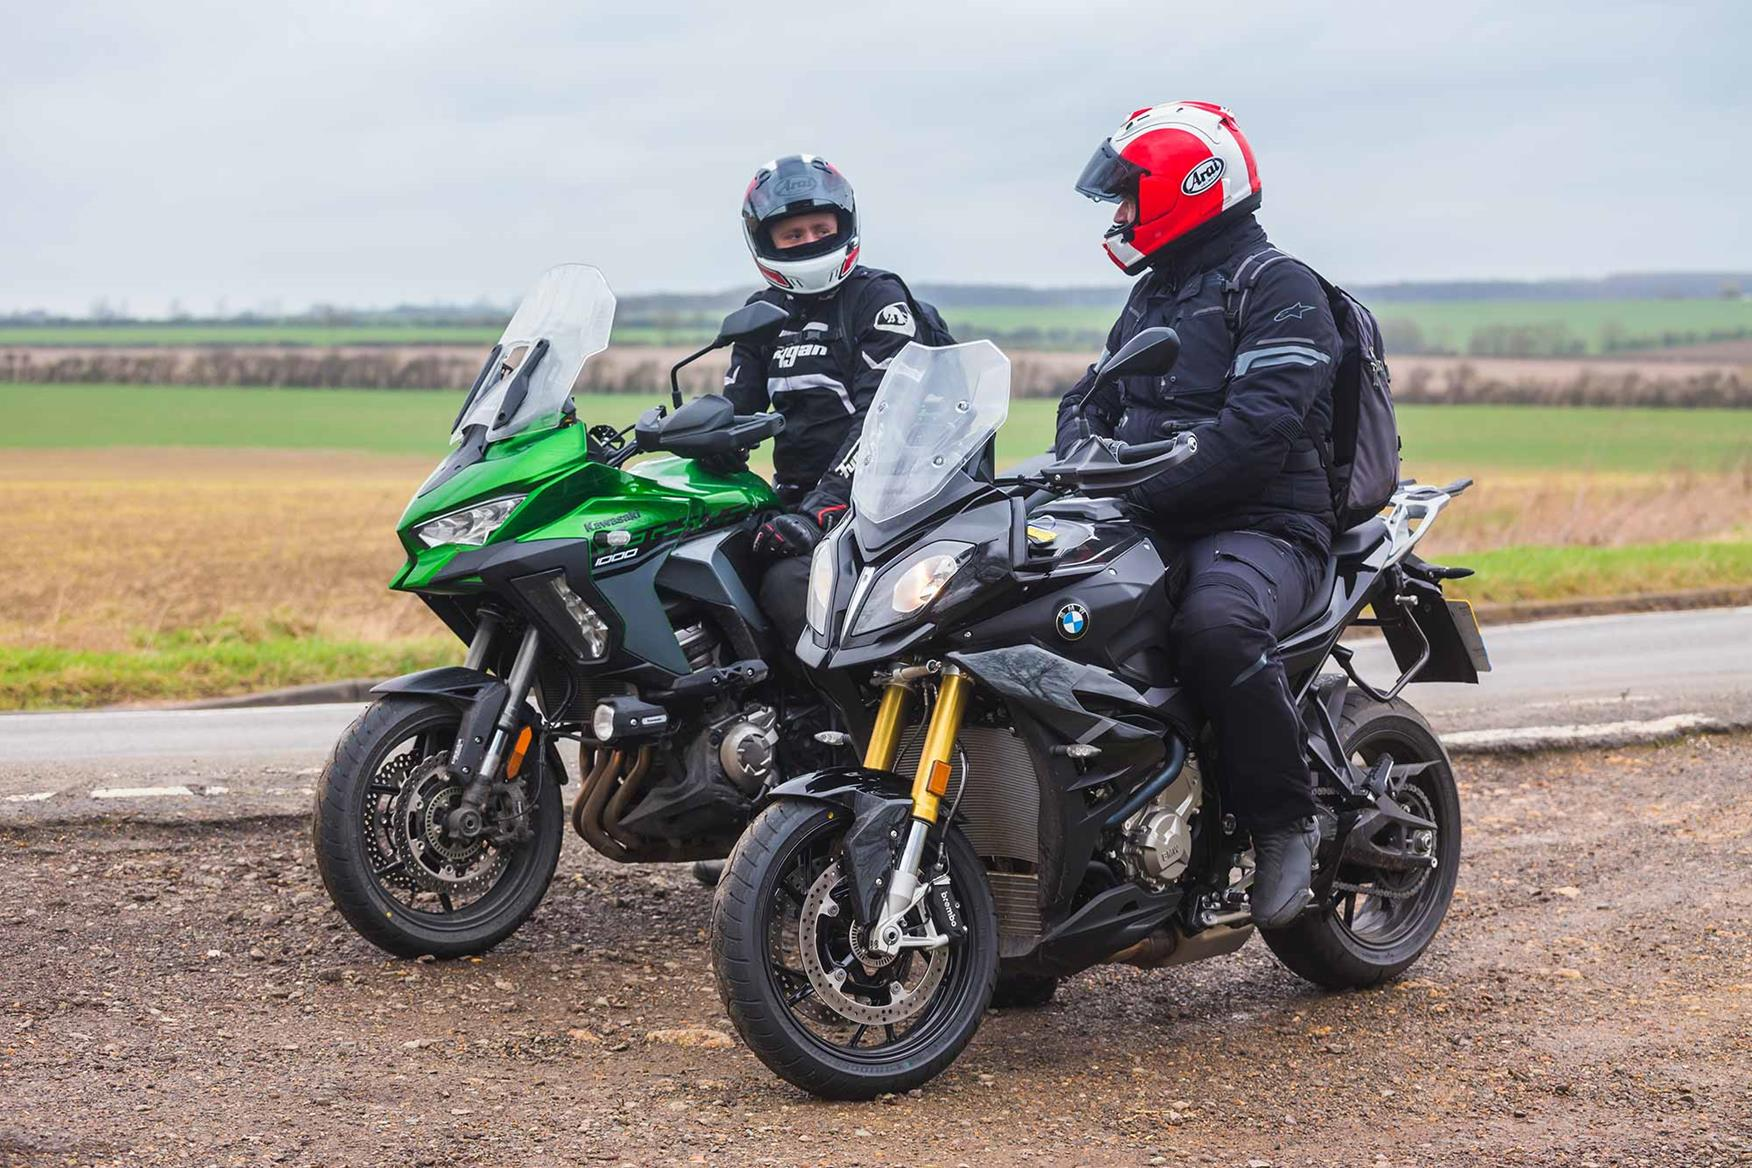 Kawasaki Versys 1000 SE vs. BMW S1000XR